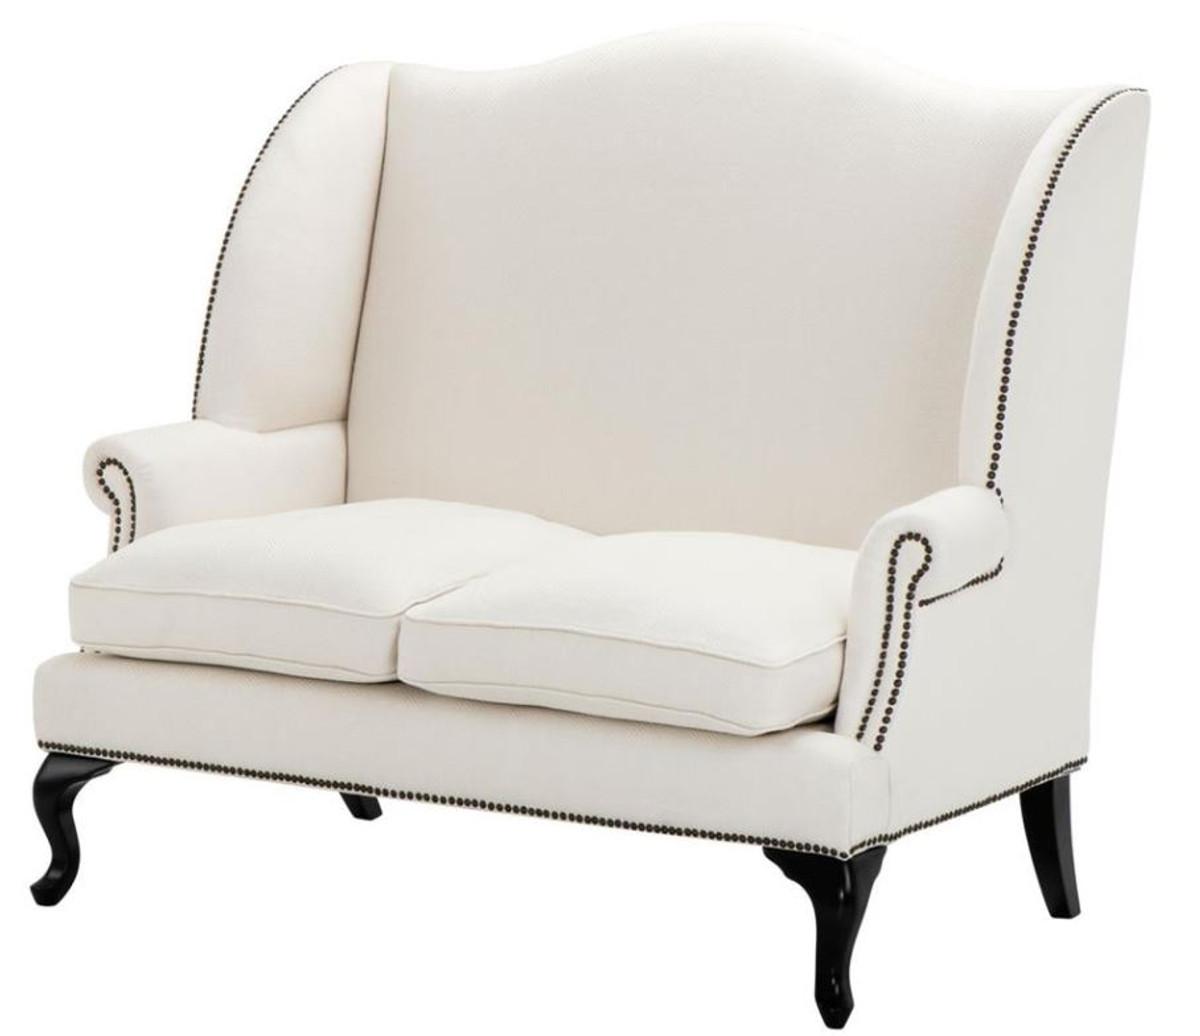 casa padrino designer sofa white 144 x 80 x h 150 cm luxury hotel furnishings sofas luxury. Black Bedroom Furniture Sets. Home Design Ideas